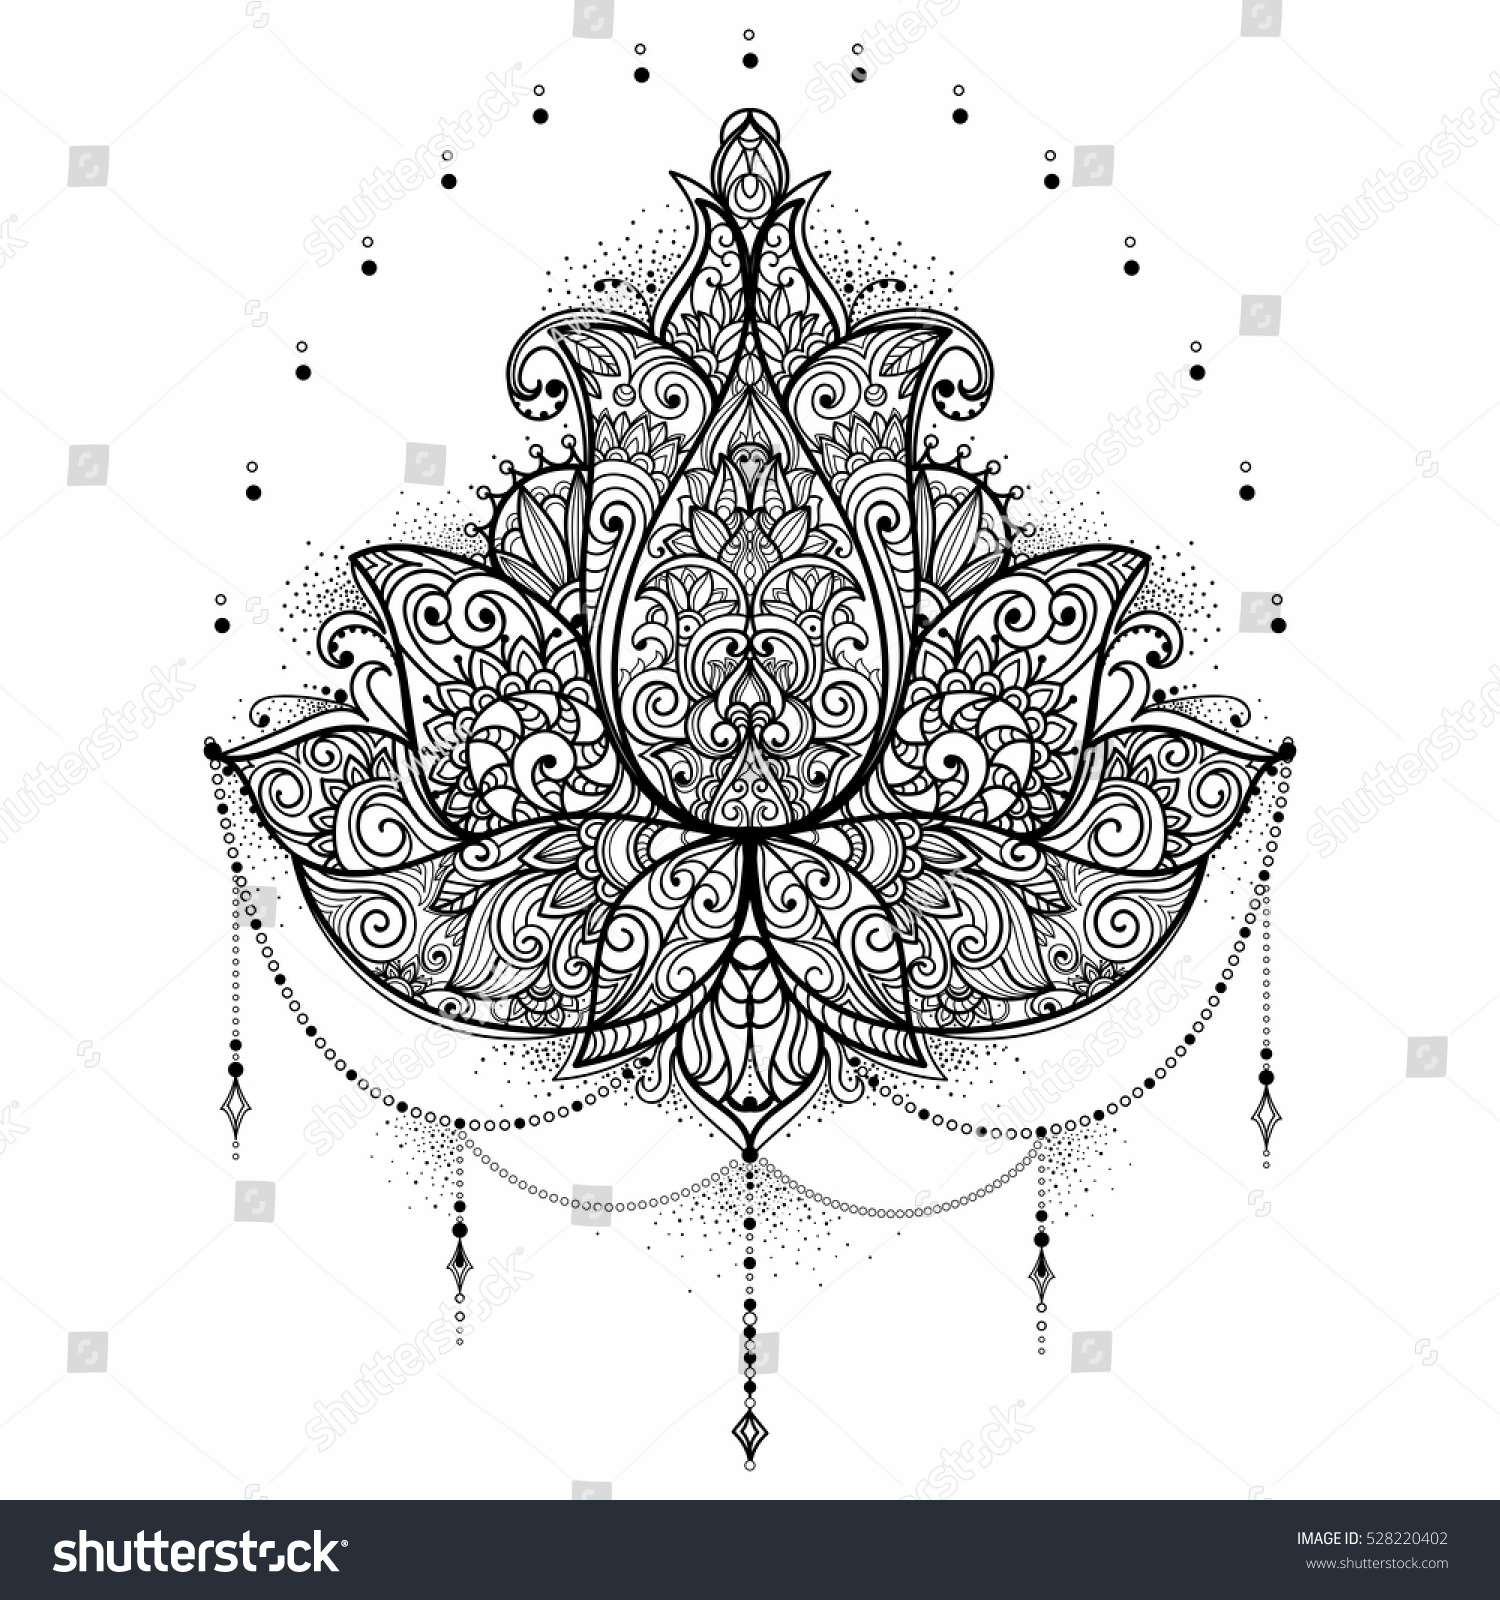 Hand drawn ornamental lotus flower adult stock vector 528220402 hand drawn ornamental lotus flower for adult coloring book tattoo t shirt design izmirmasajfo Images